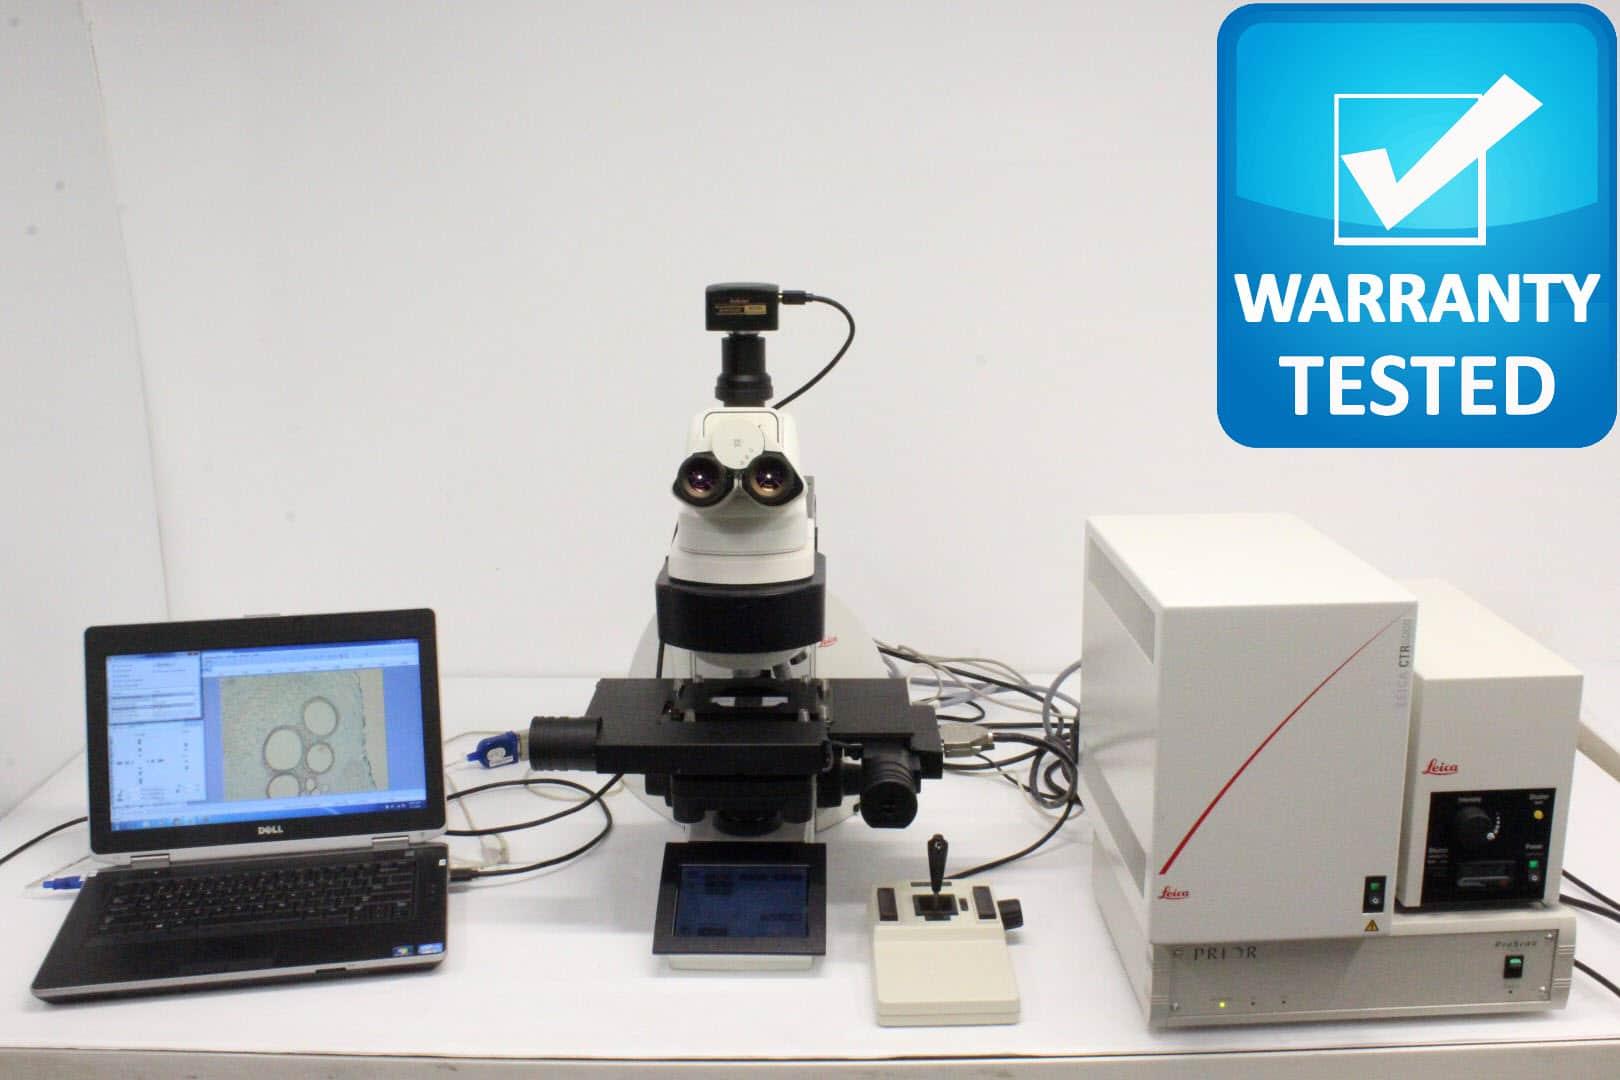 Leica DM6000 B Motorized Fluorescence Phase Contrast Microscope DM6000B